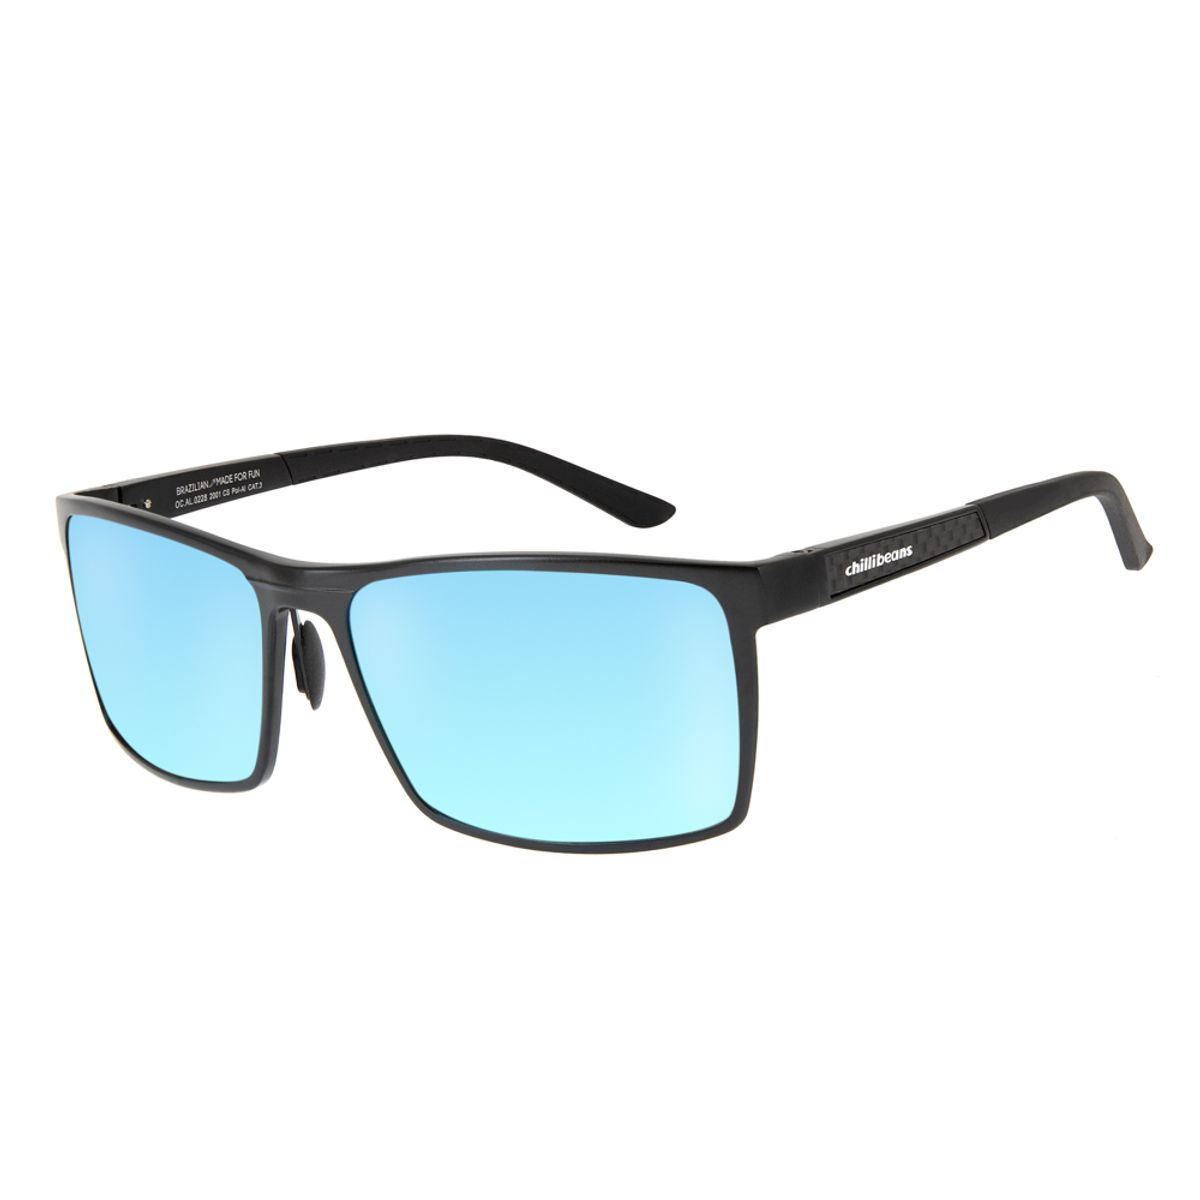 eeaa9fd51 Óculos de Sol Chilli Beans Esportivo Masculino Quadrado Polarizado Degradê  0228 ...